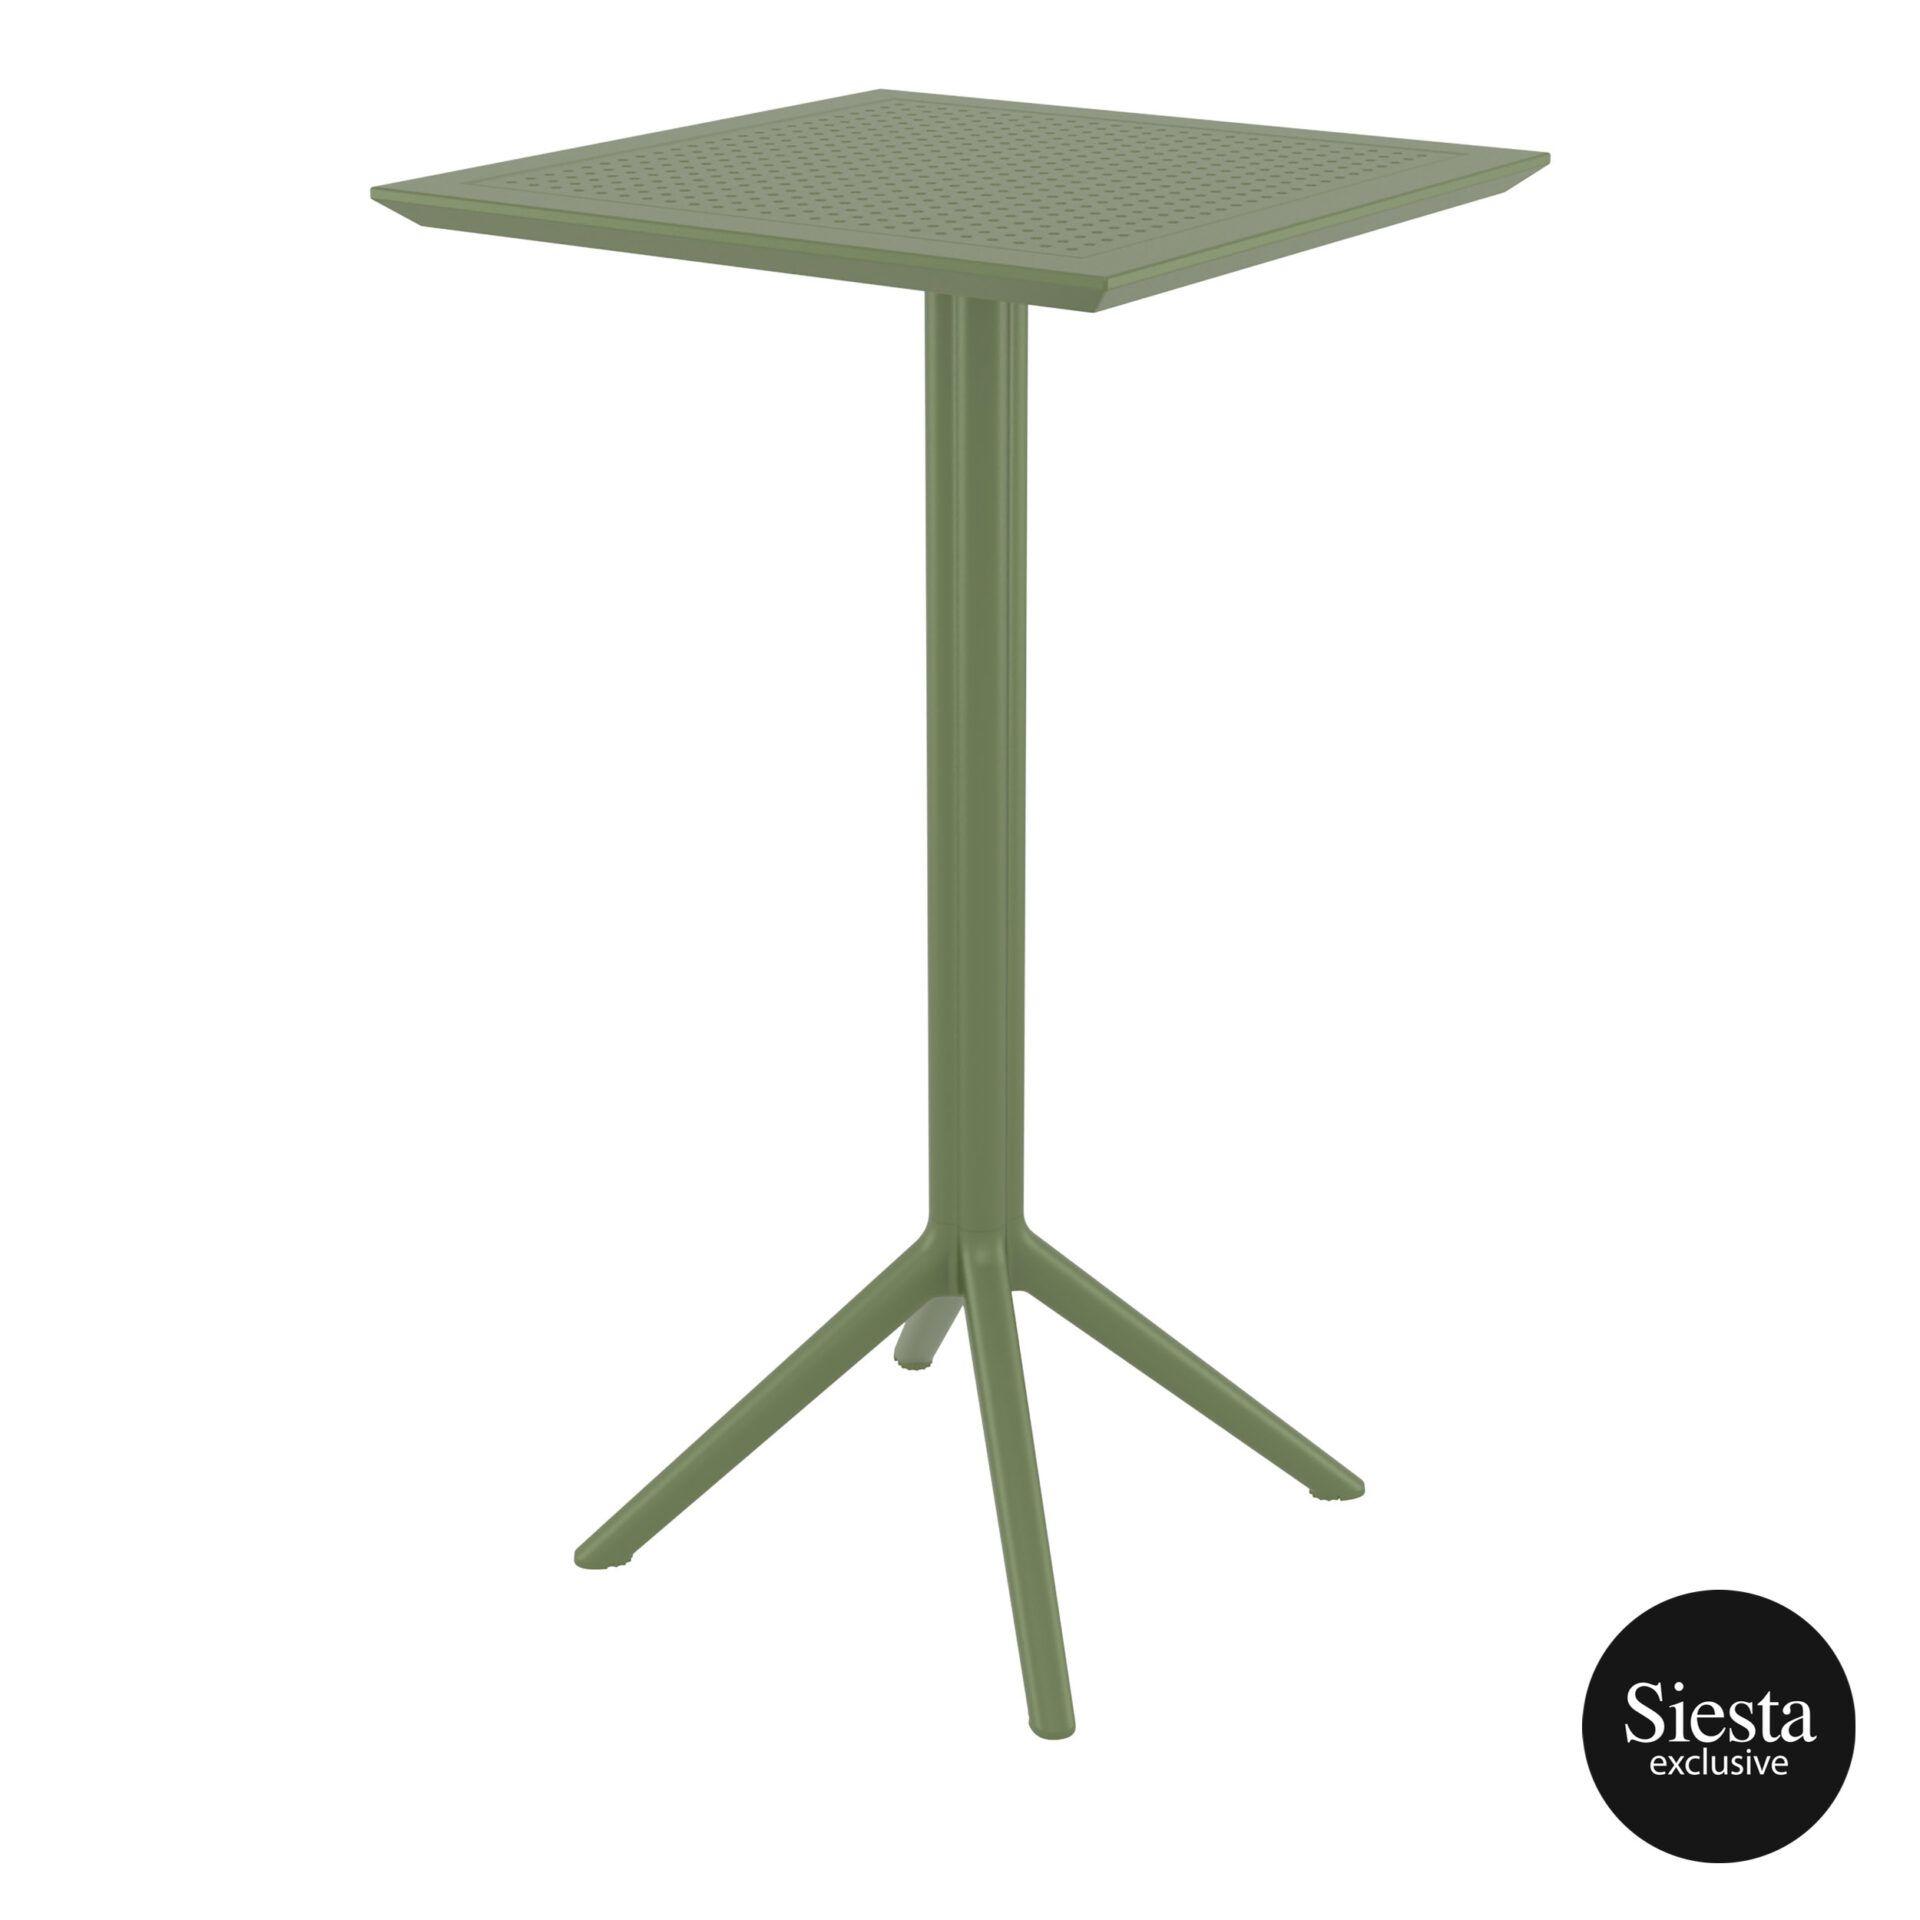 polypropylene outdoor sky folding bar table 60 olive green front side 2